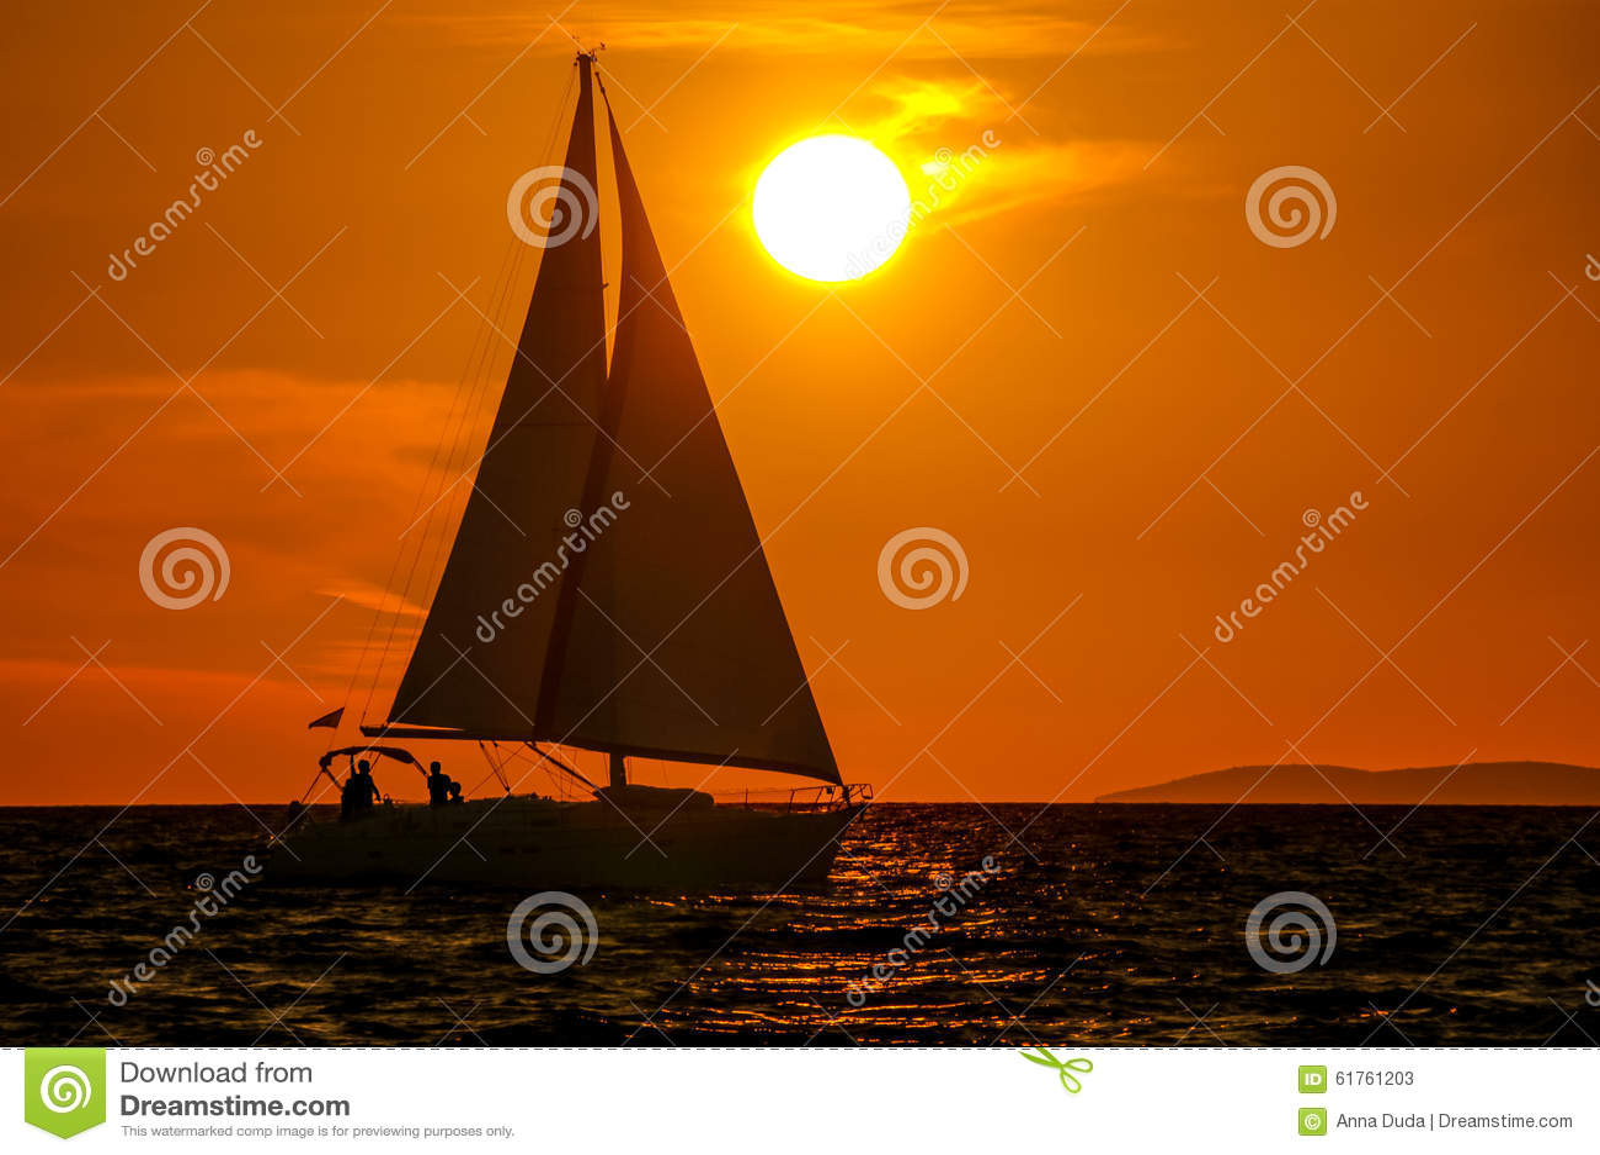 Sailboat-ηλιοβασίλεμα-πορτοκαλής ουρανός